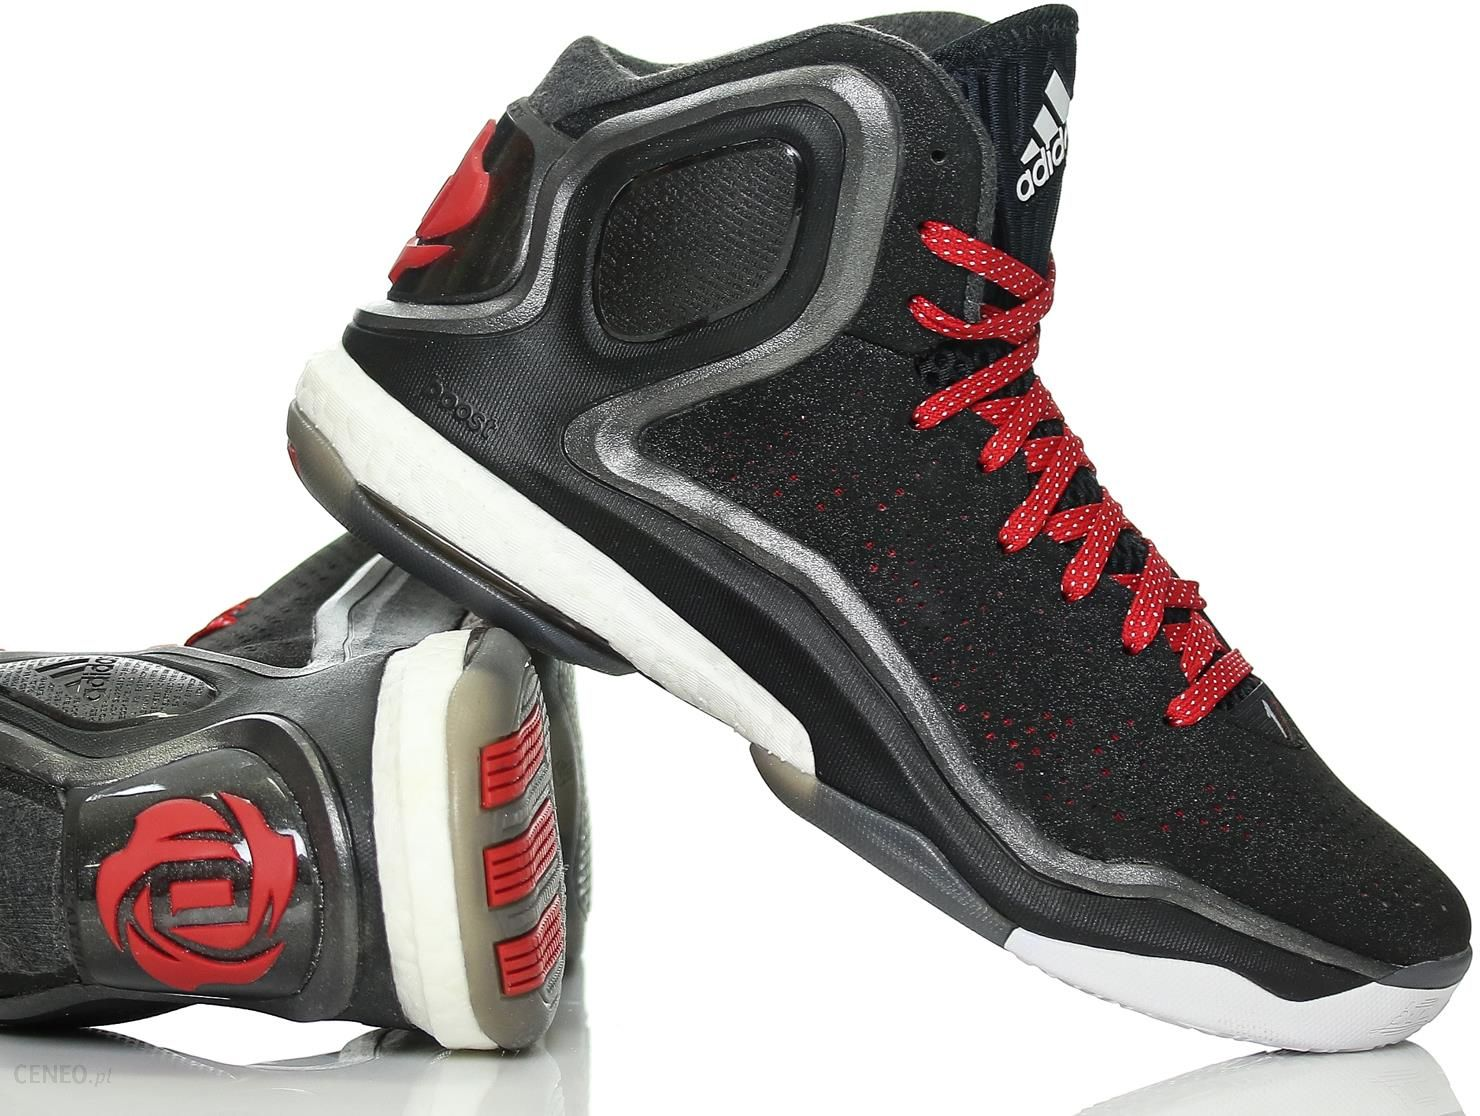 huge selection of 4aa9d fdd5e Buty męskie Adidas D Rose 5 Boost G98704 - zdjęcie 1